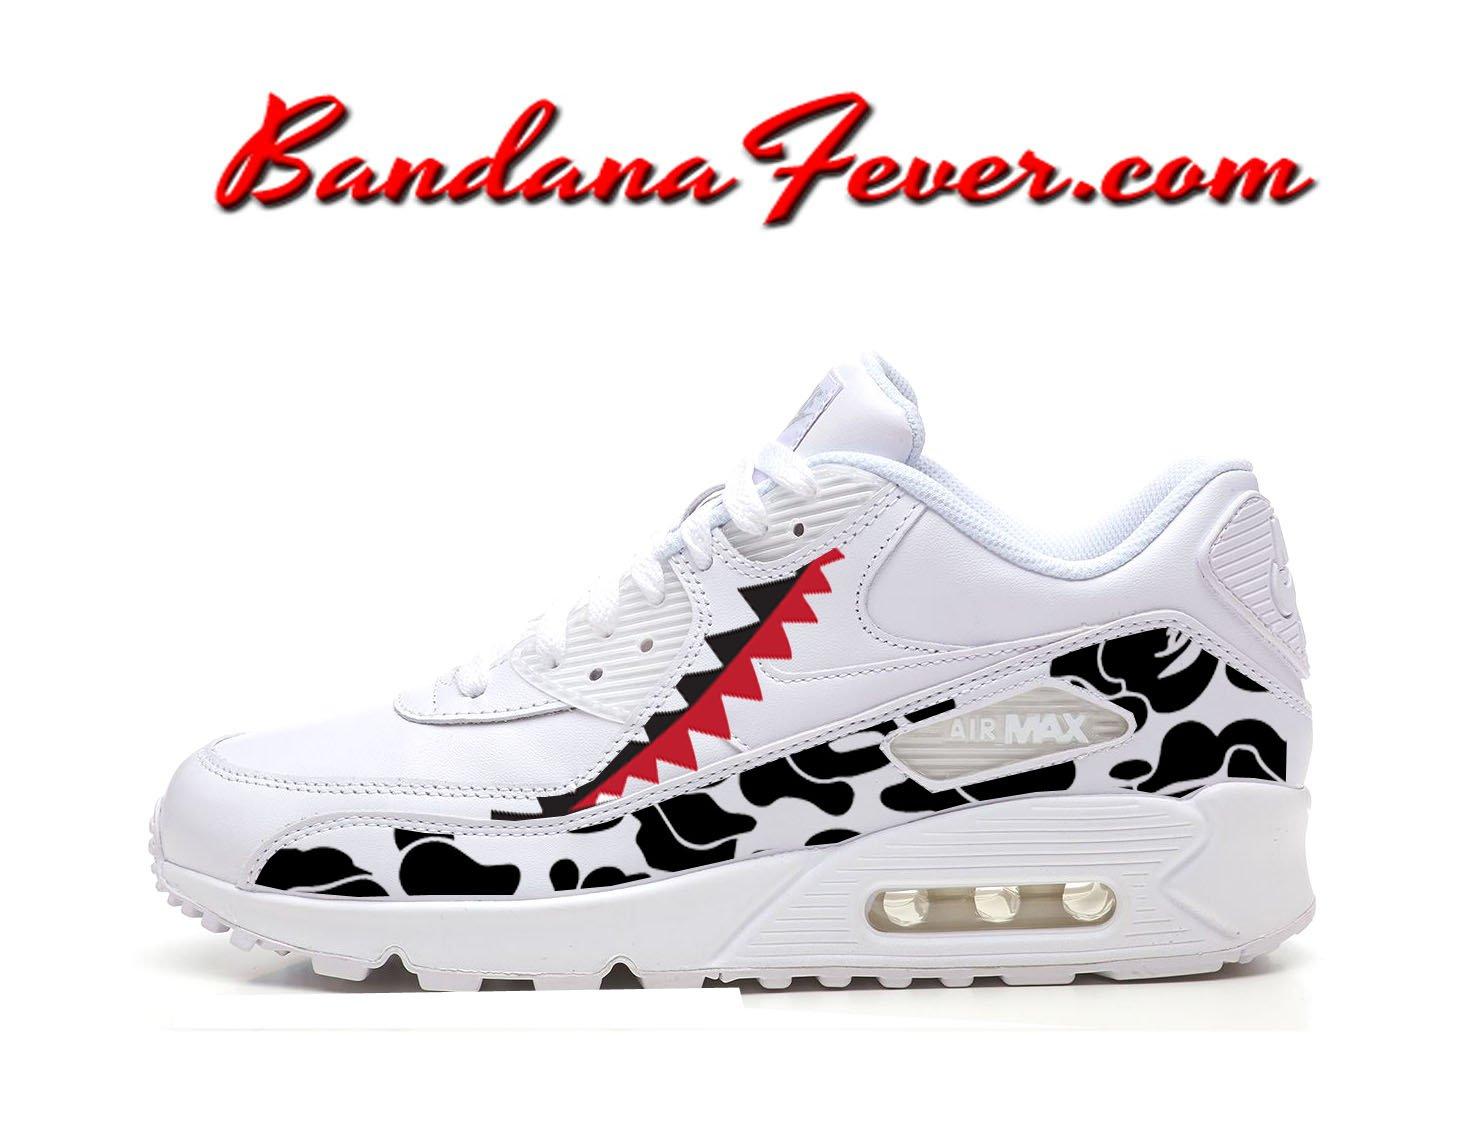 af09bd167834f Custom Bape Camo Shark Nike Air Max 90 Shoes Ultra White, #bape, #camo,  #love, by Bandana Fever